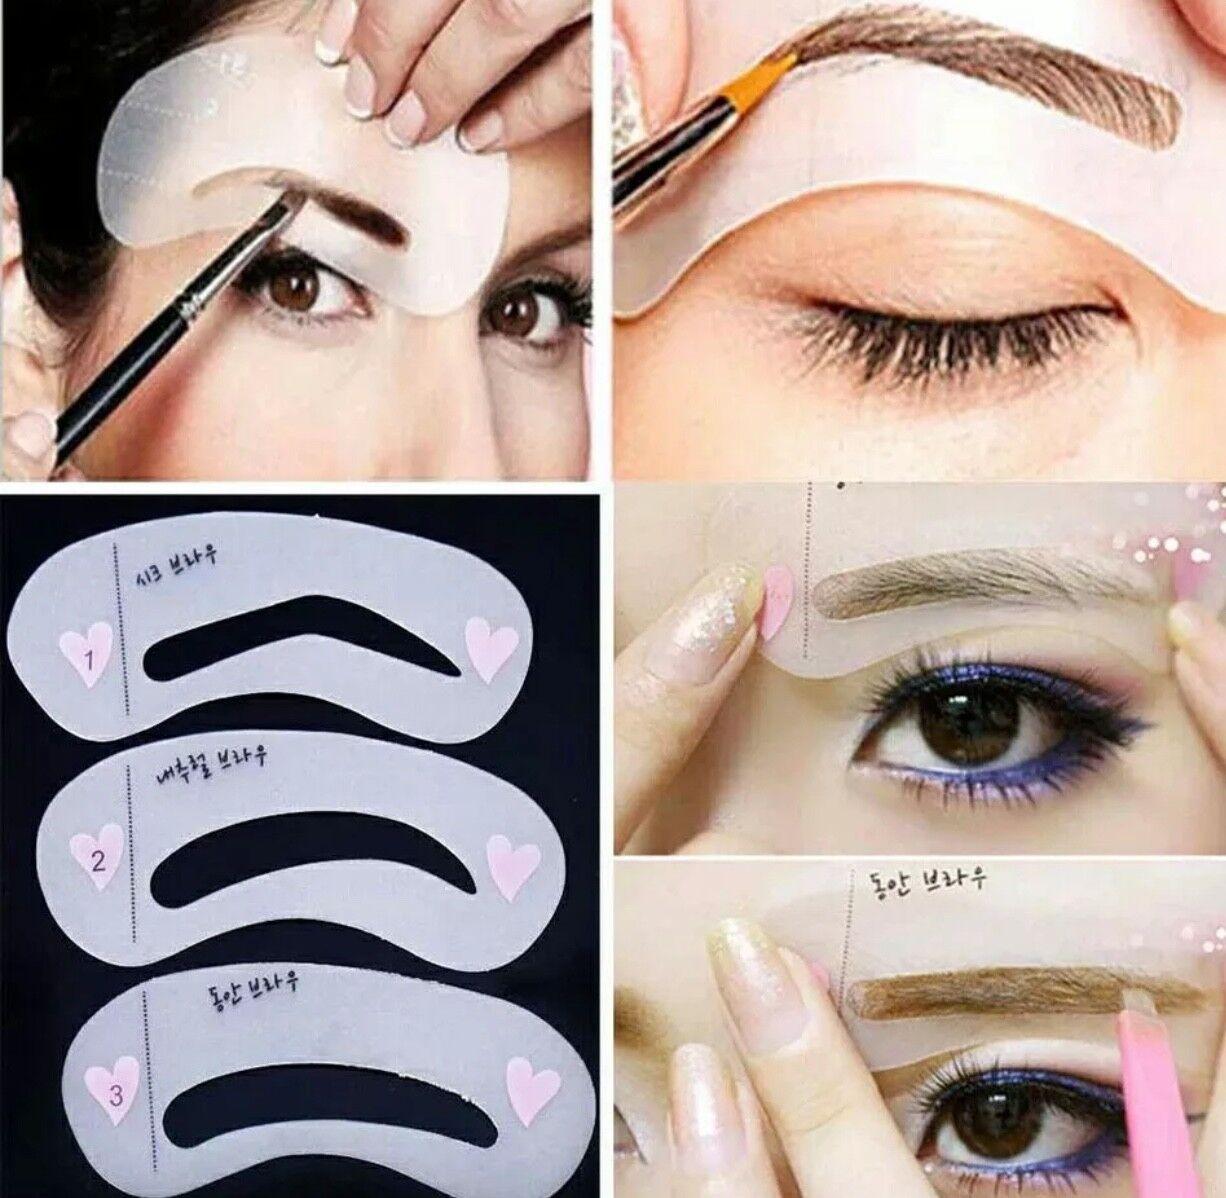 6 Eyebrow Stencils Shaper Grooming Kit Brow Makeup Template Tool